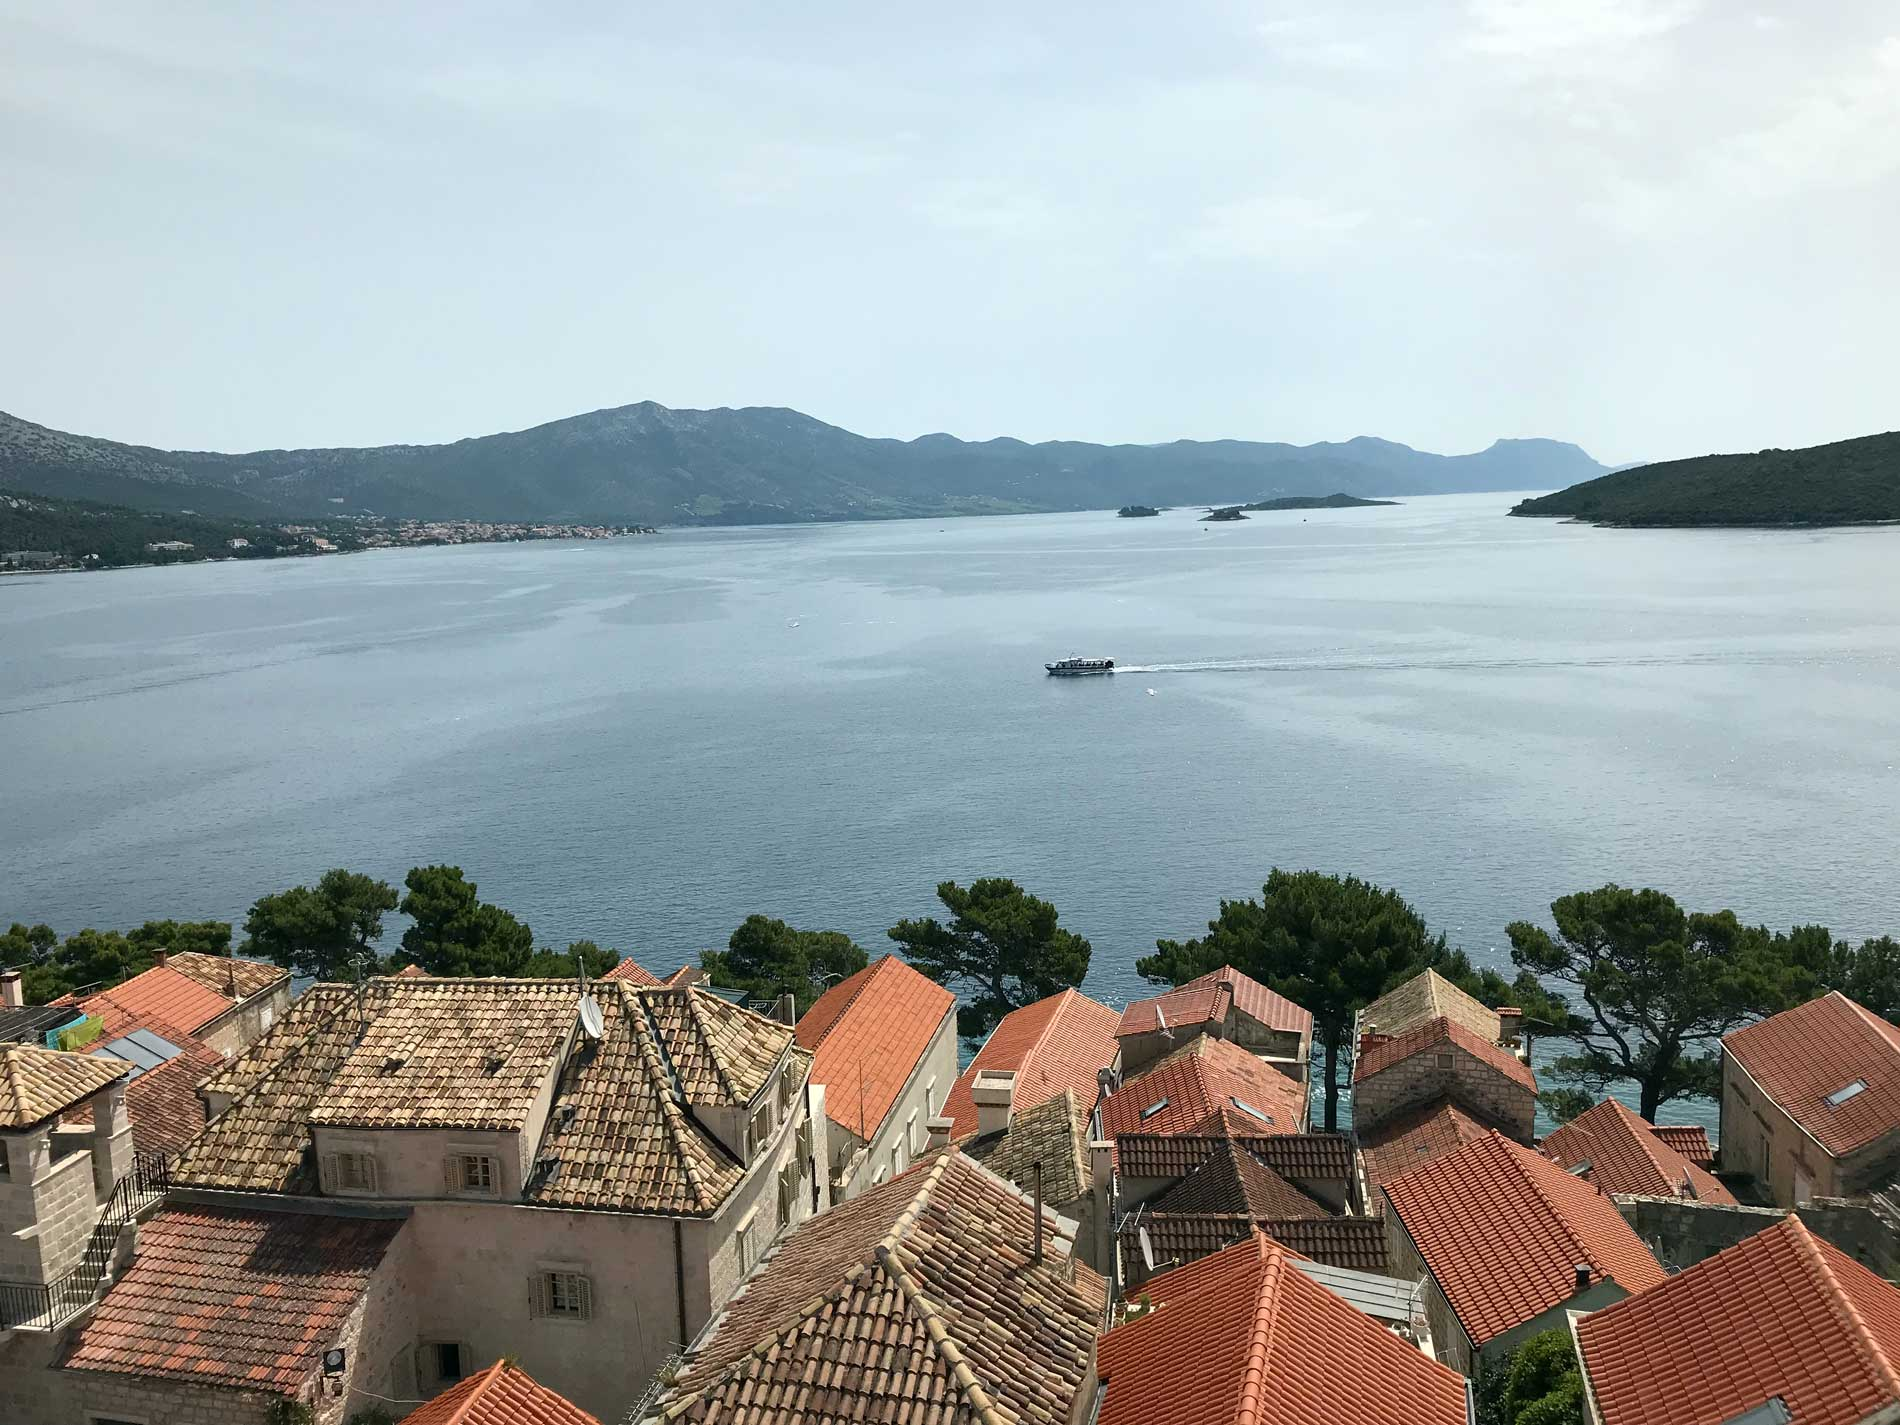 Panorama-dal-Campanile-chiesa-San-Marco-Korcula-Croazia-tetti-mare-isole